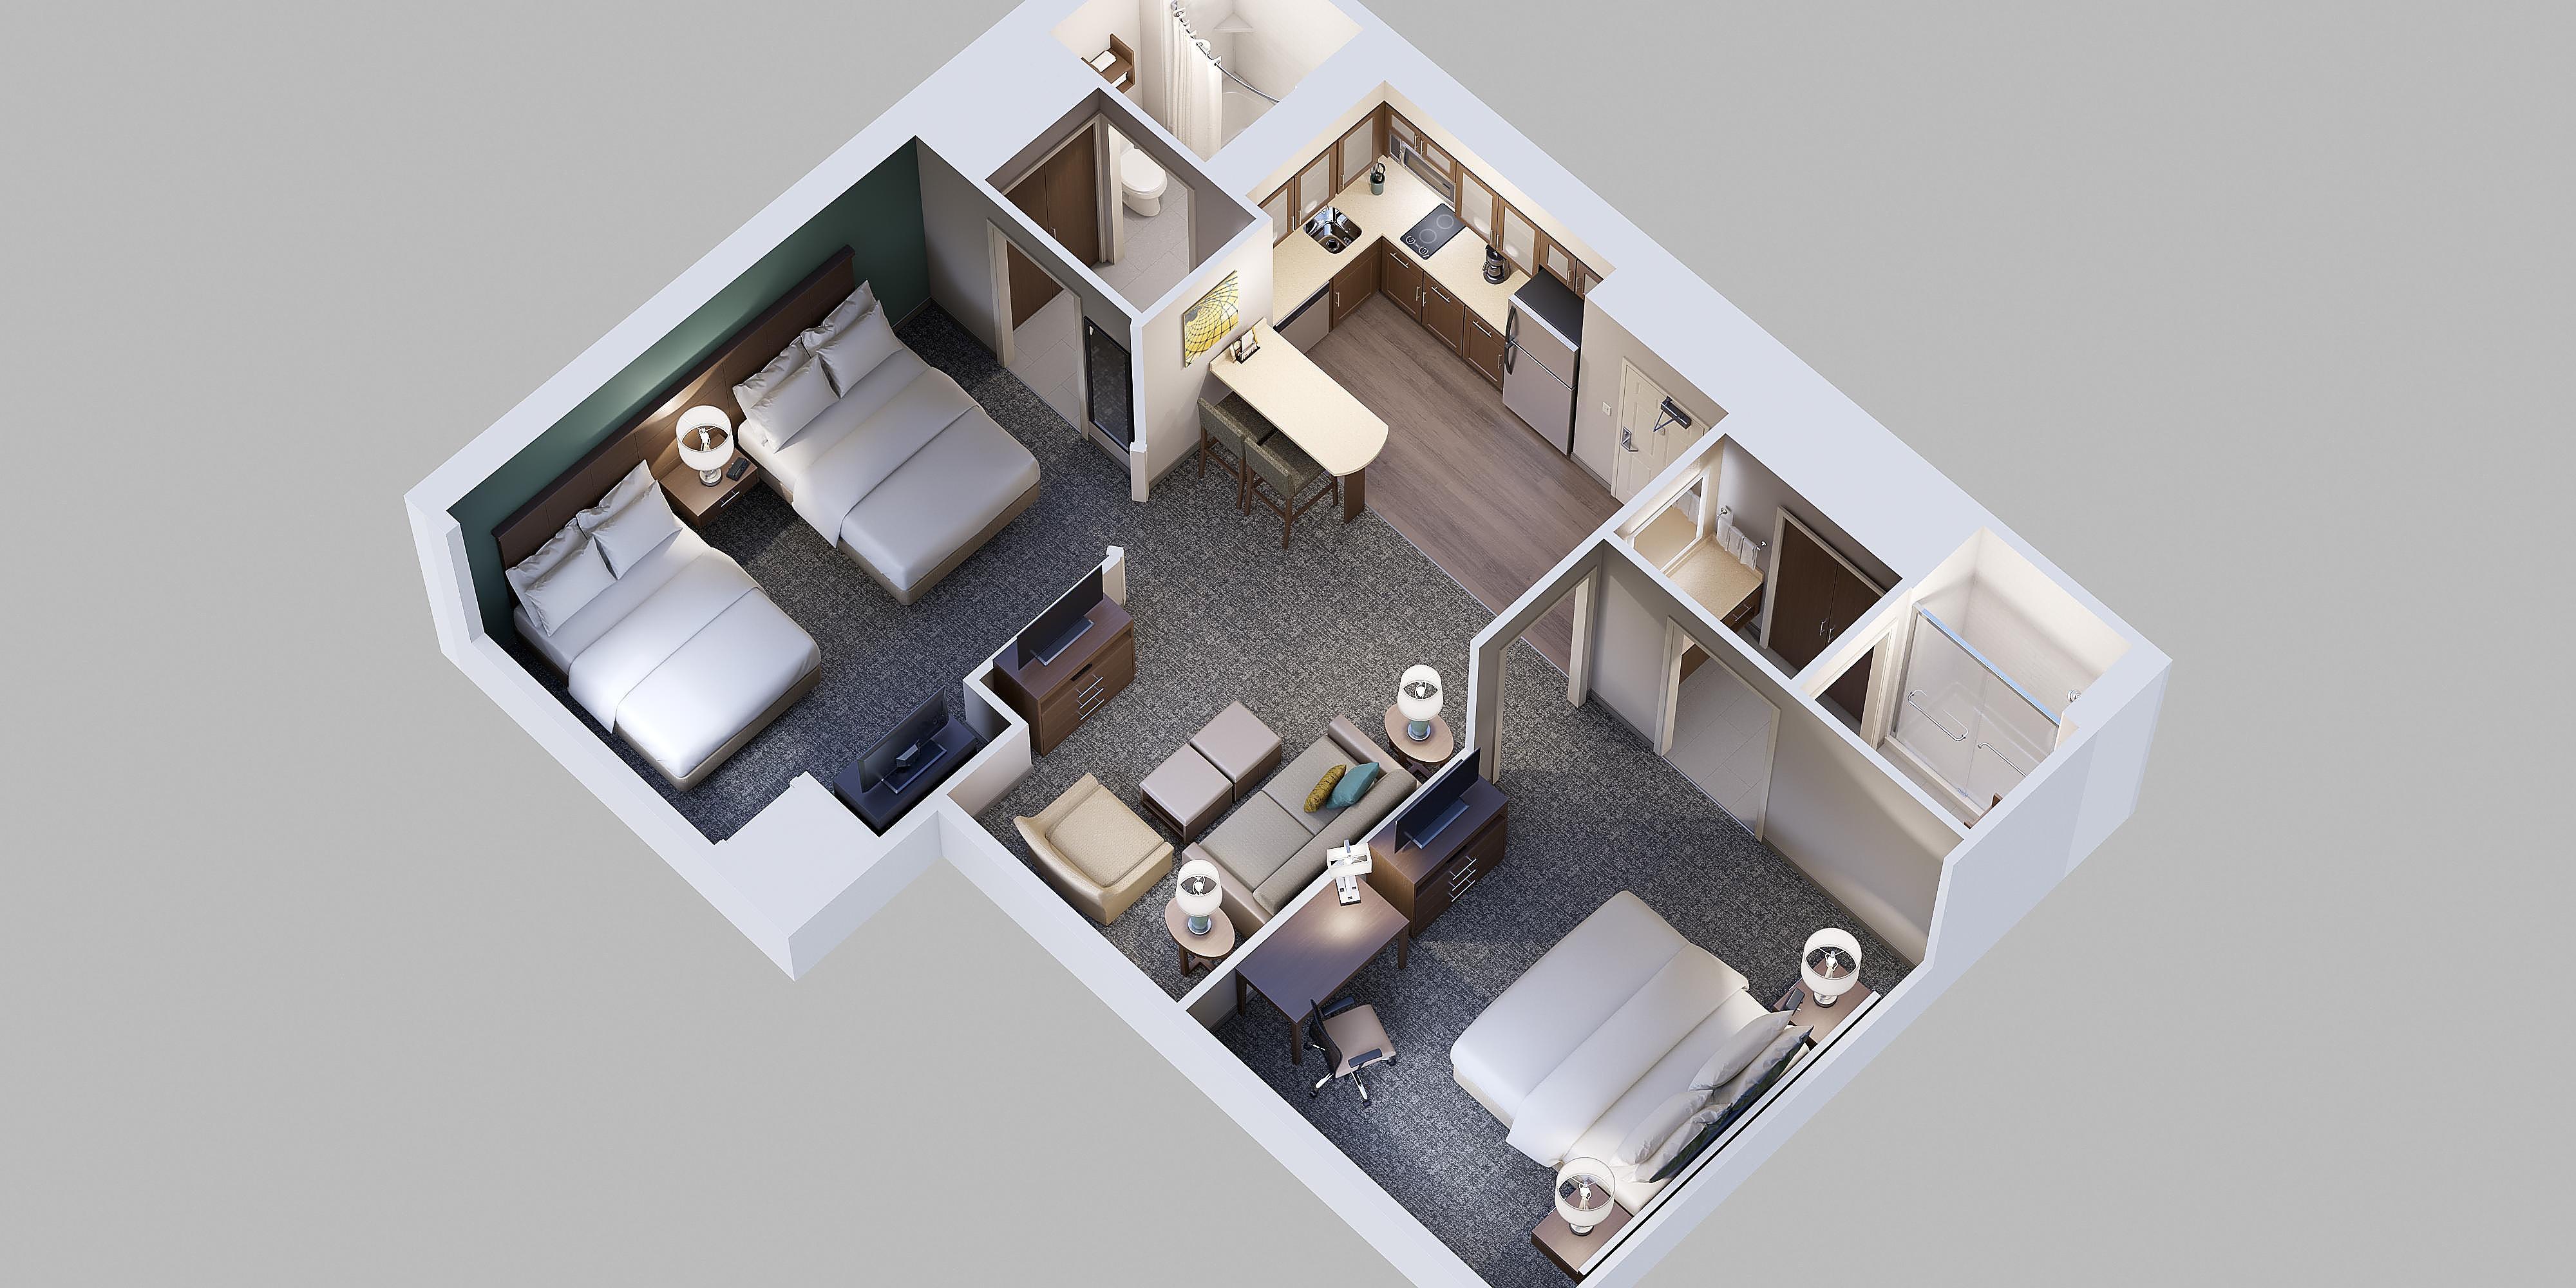 Staybridge Suites Hillsboro Hotels Staybridge Suites Hillsboro South Hotel Room Rates